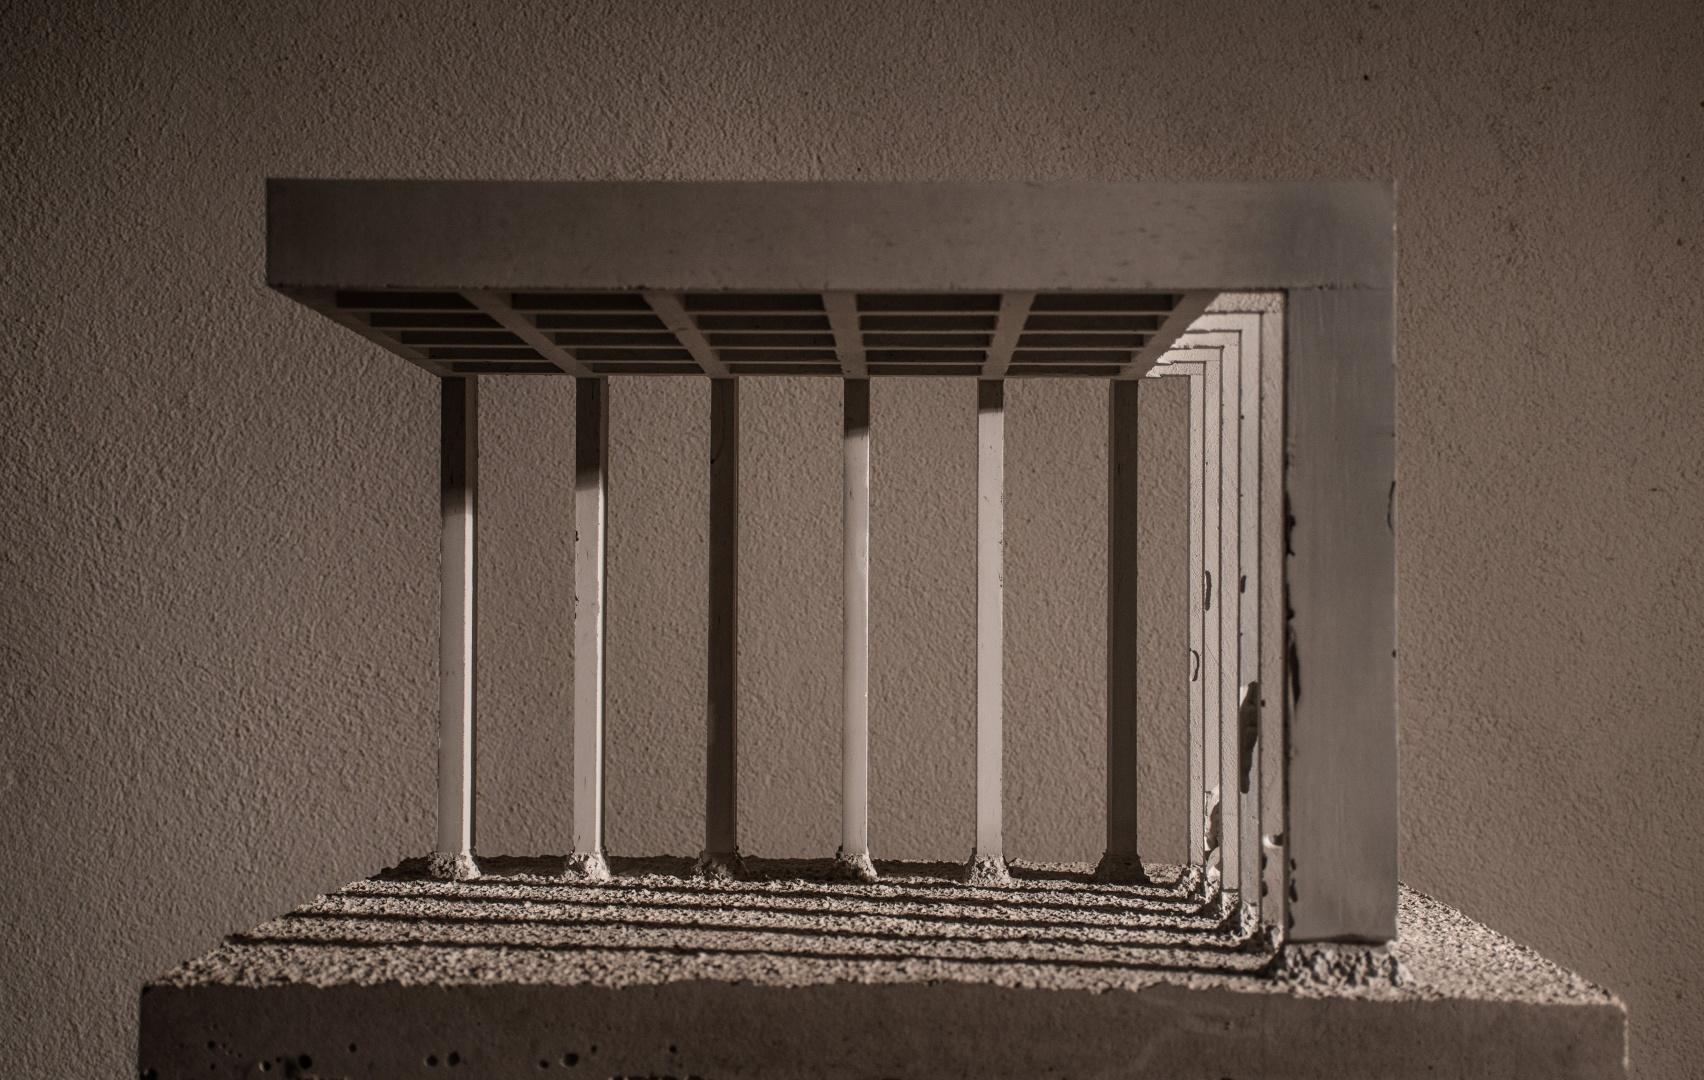 Modell Ausschnitt I Gebäudestruktur innen © Barbara Ruech